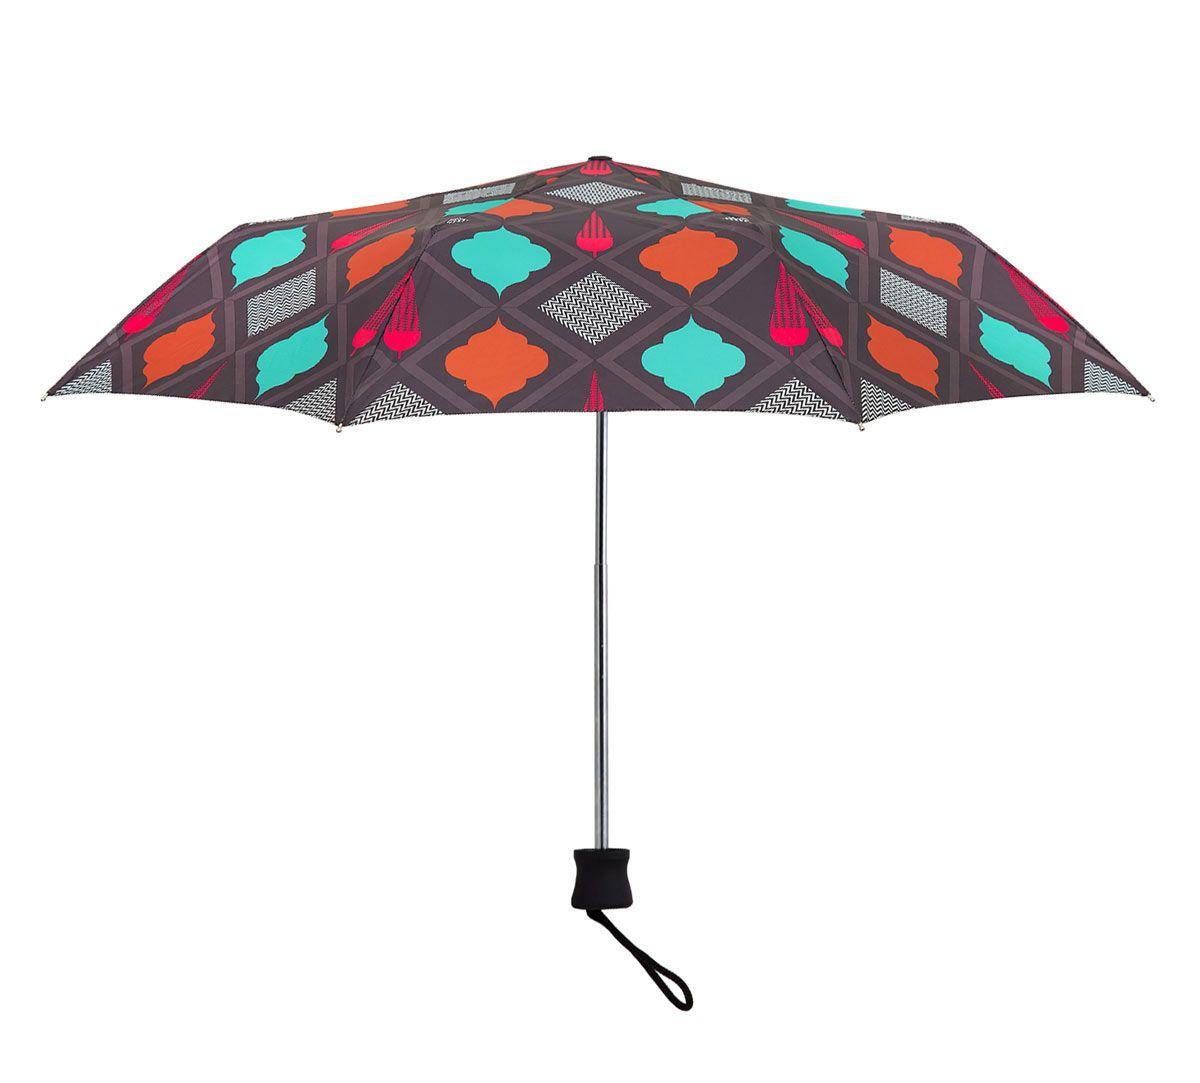 India Circus Assorted Geometry 3 Fold Umbrella